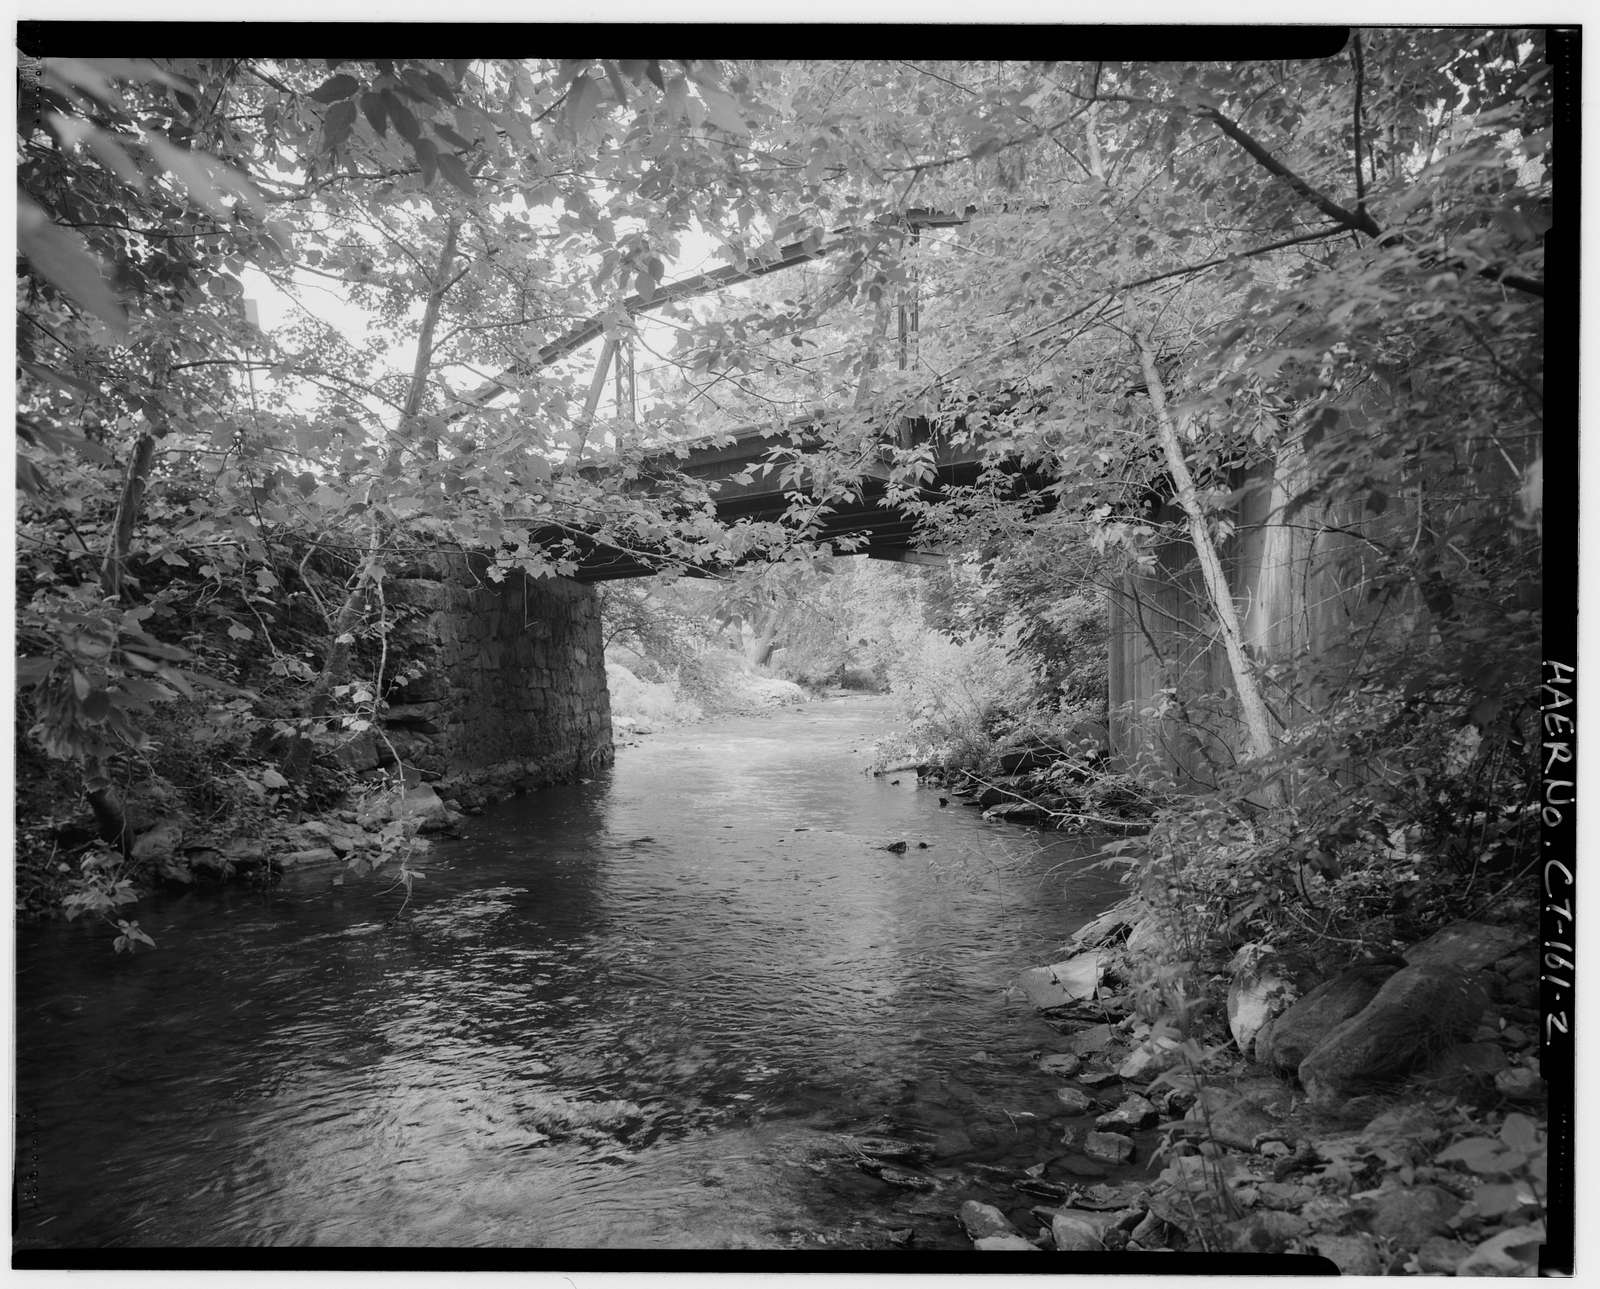 Sharon Station Road Bridge, Sharon Station Road spanning Webatuck Creek, Sharon, Litchfield County, CT